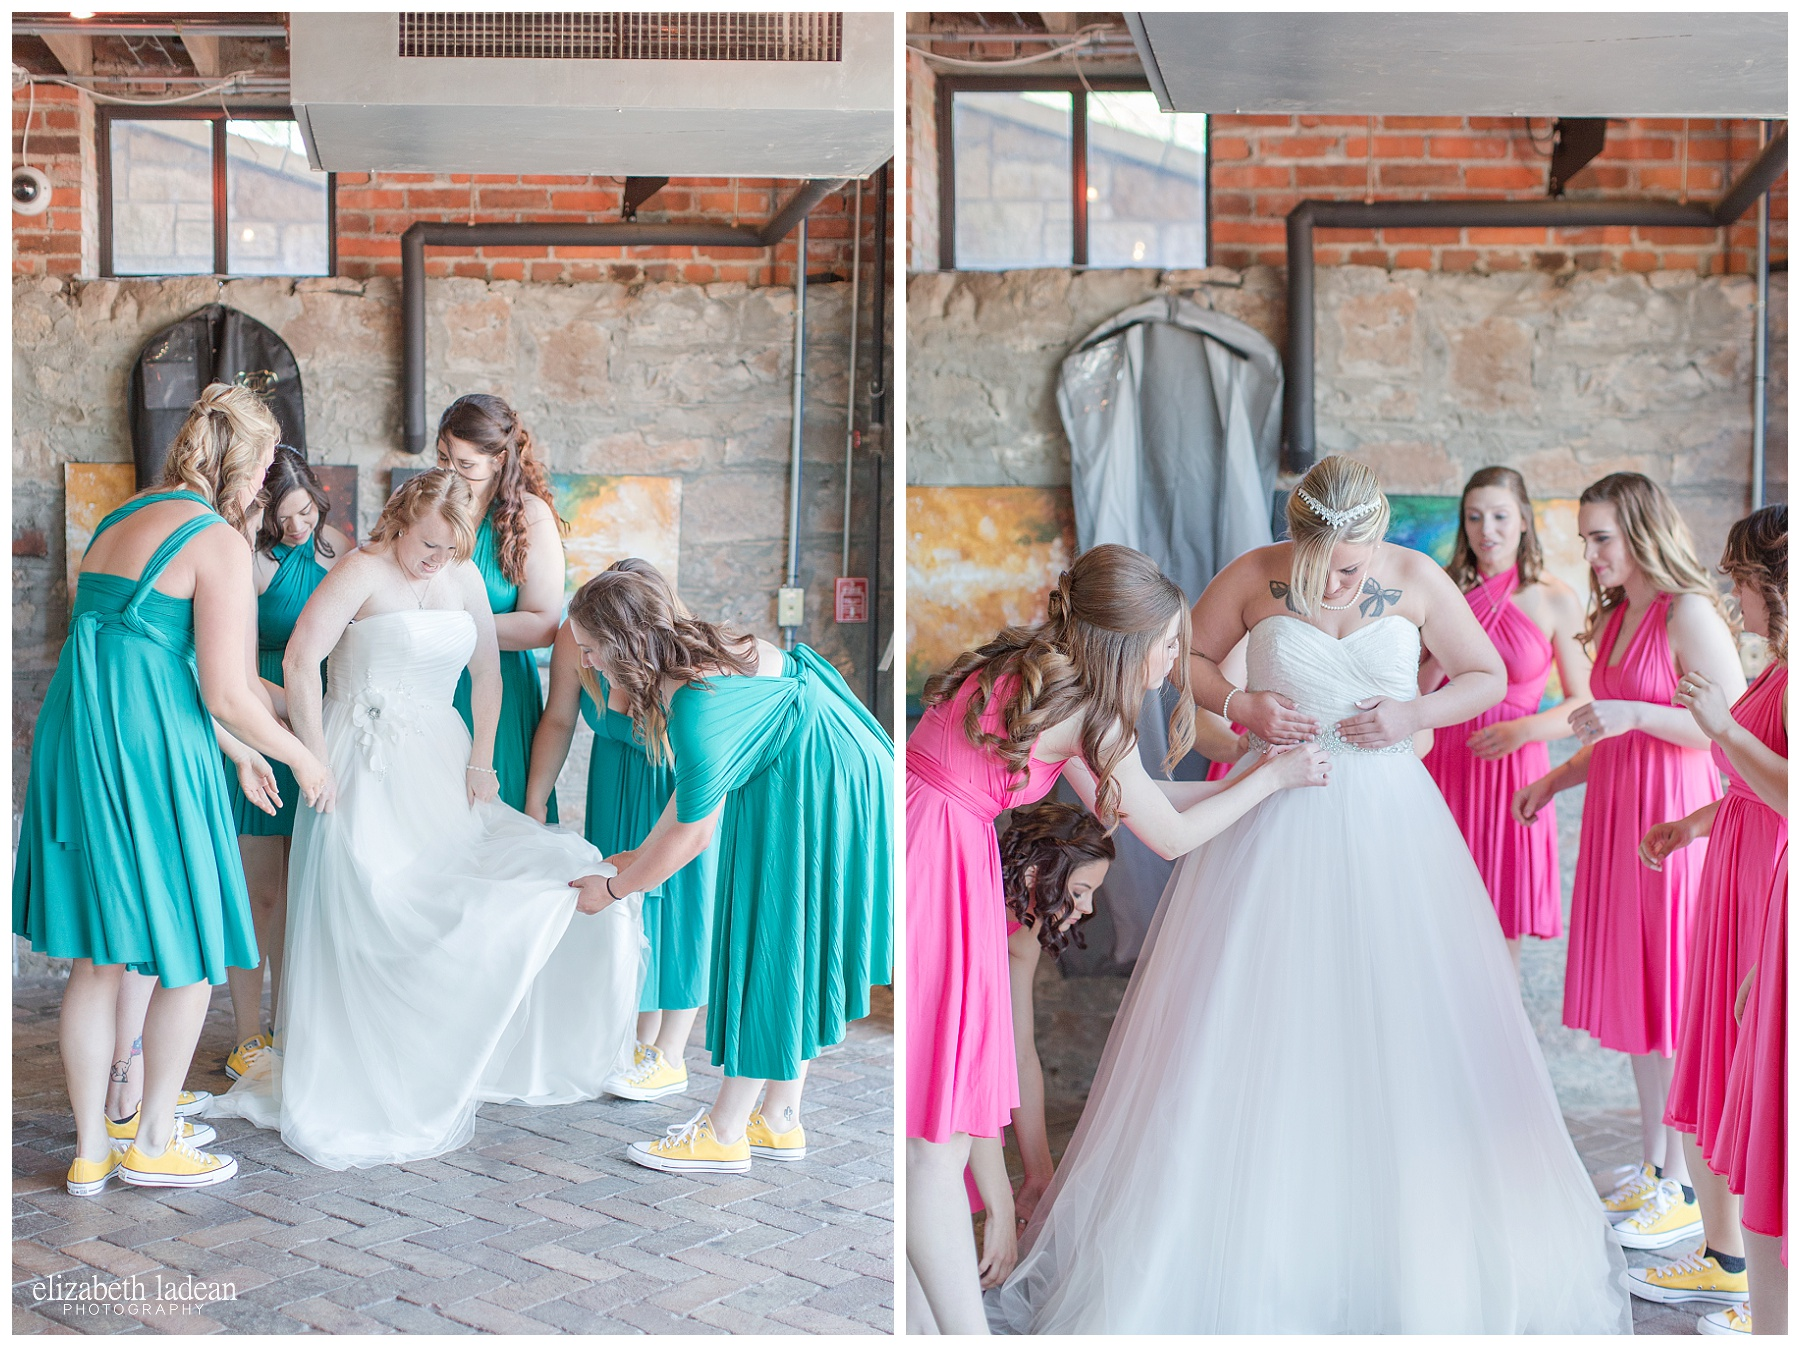 Thompson-Barn-Kansas-Wedding-Photography-R+J-0505-Elizabeth-Ladean-Photography-photo_0672.jpg